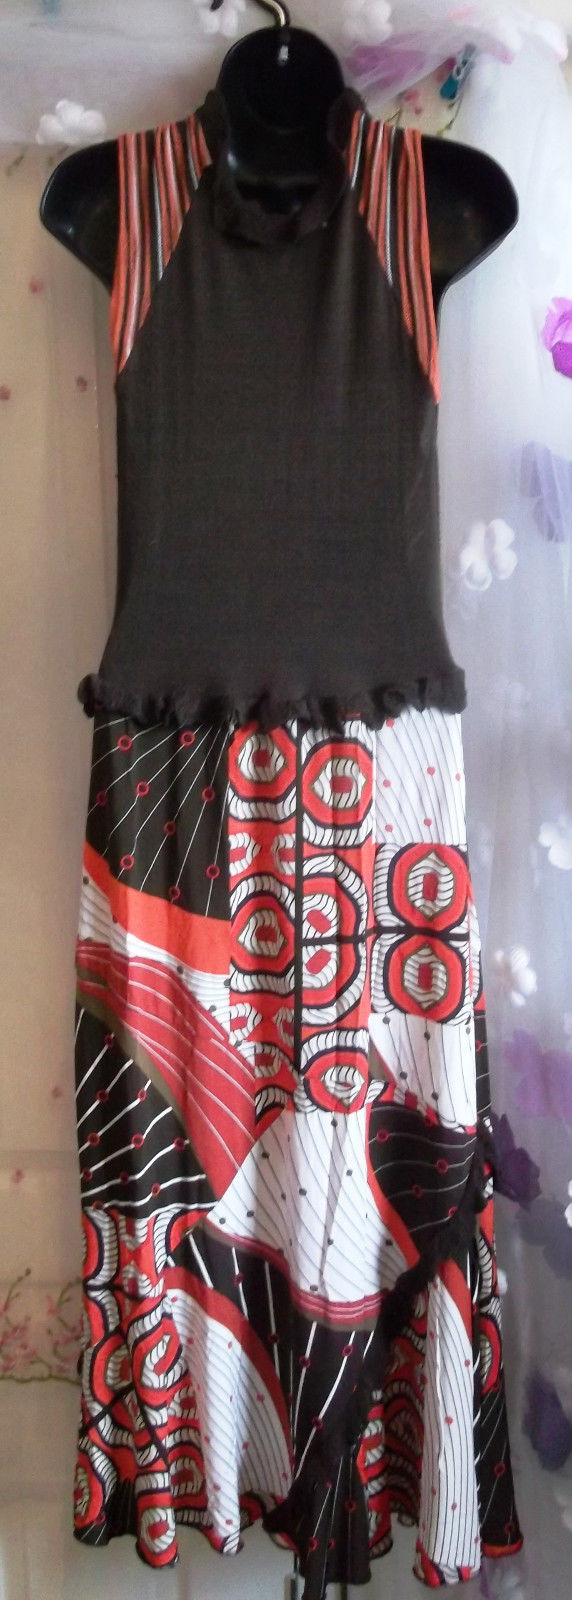 Designer Evalinka Midi Dress Boho/ Hippy Style S/M-brown/orange,lined skirt,lush